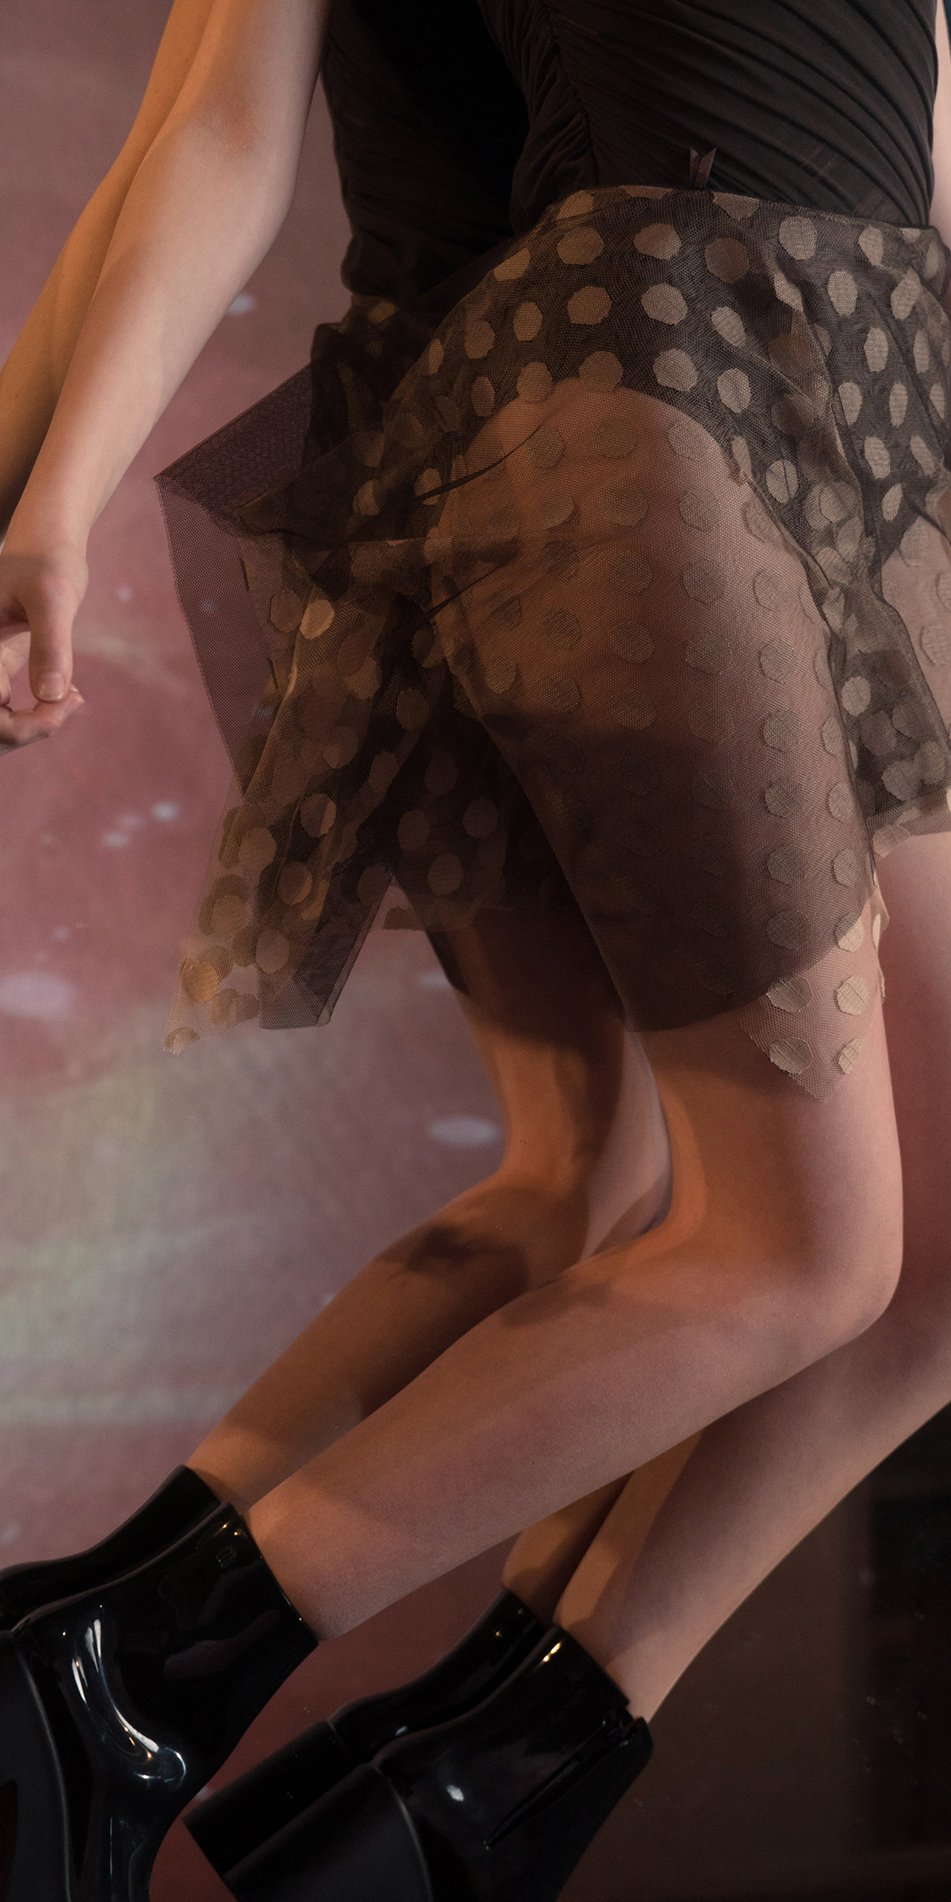 JUMBO POLKA TULLE short square skirt chocolate nude 2